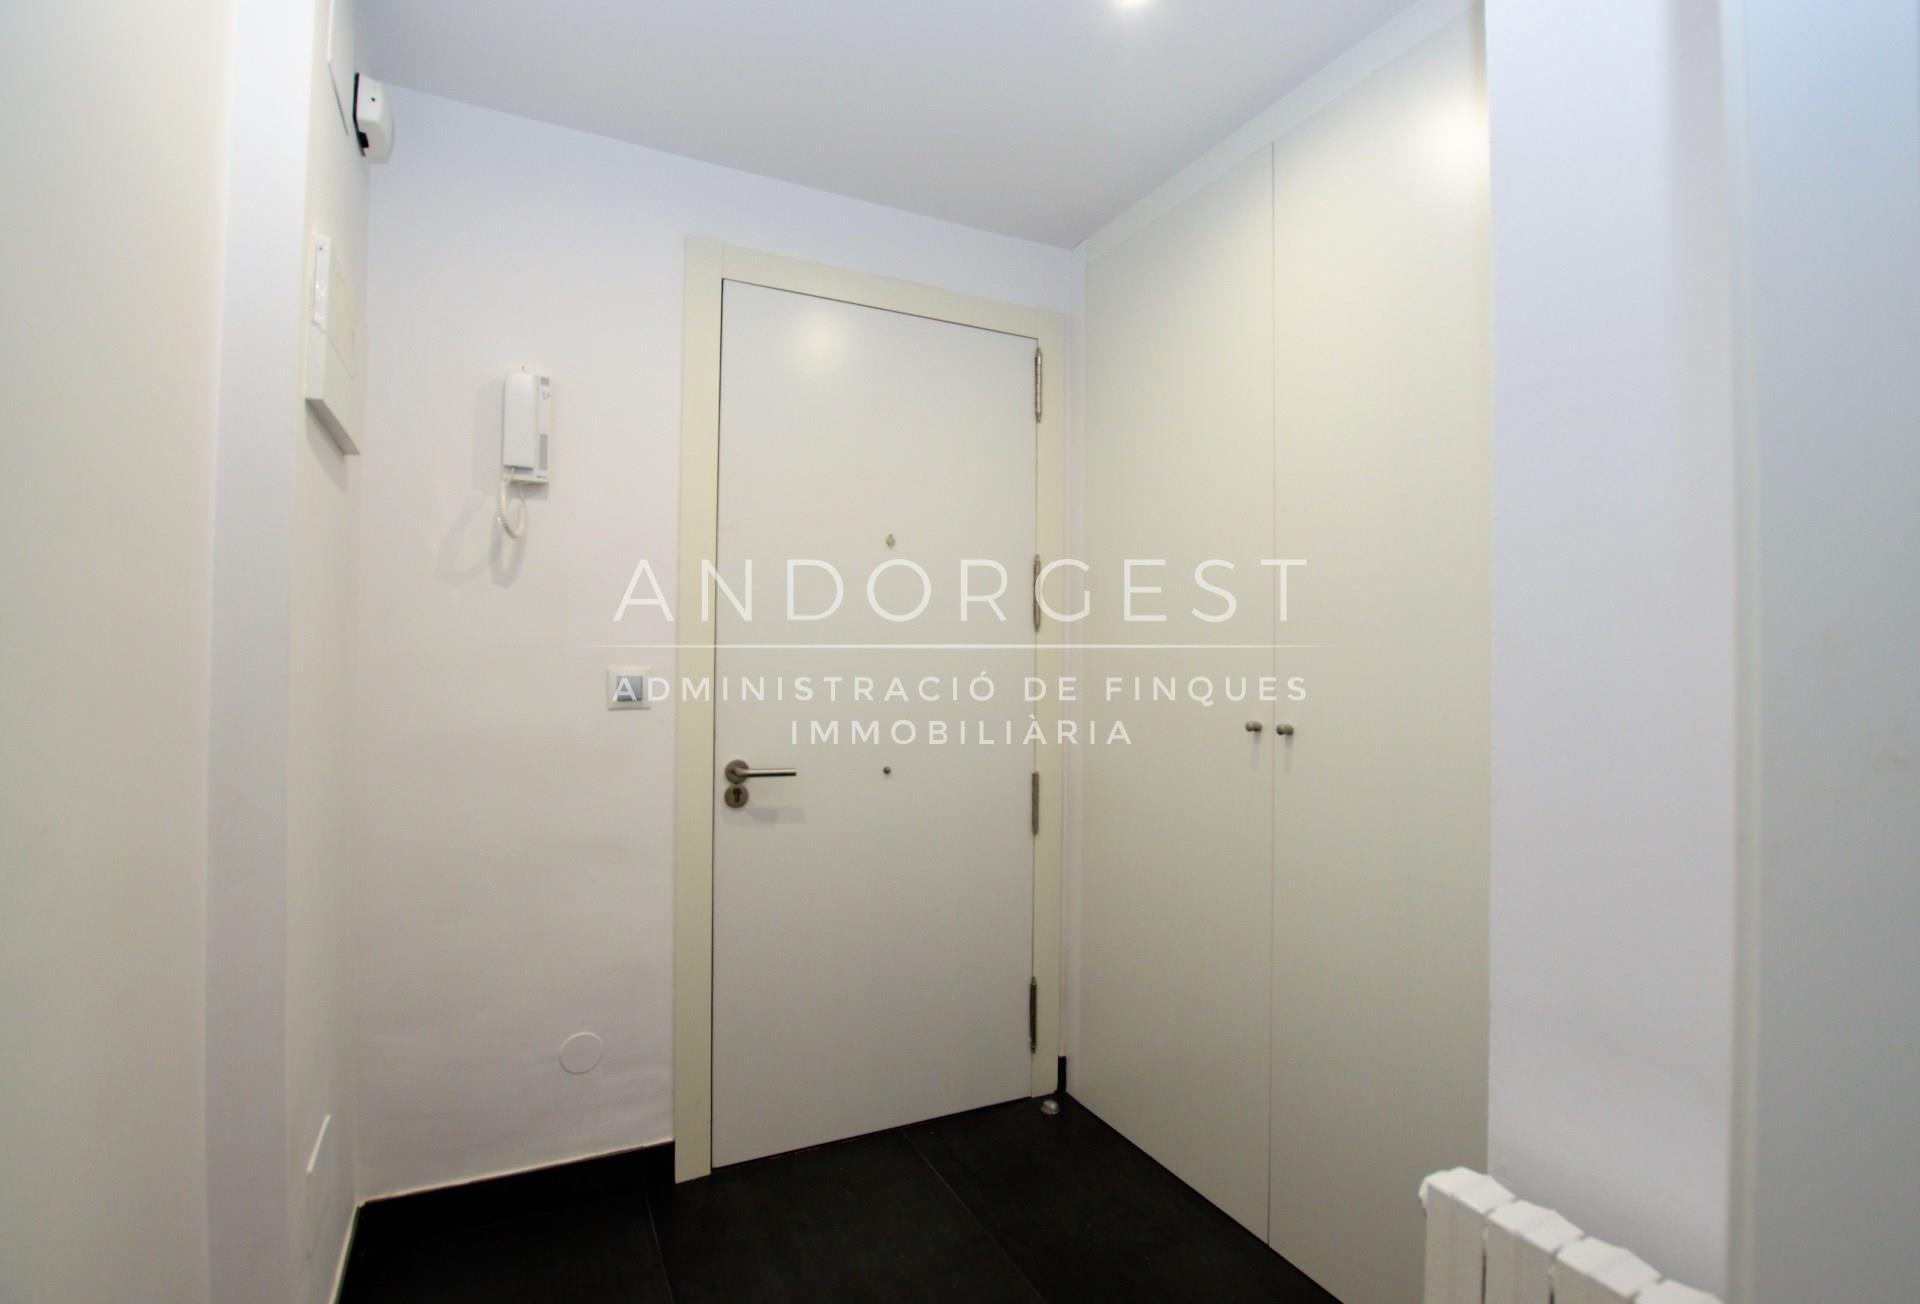 Pis en venda a Escaldes Engordany, 3 habitacions, 95 metres